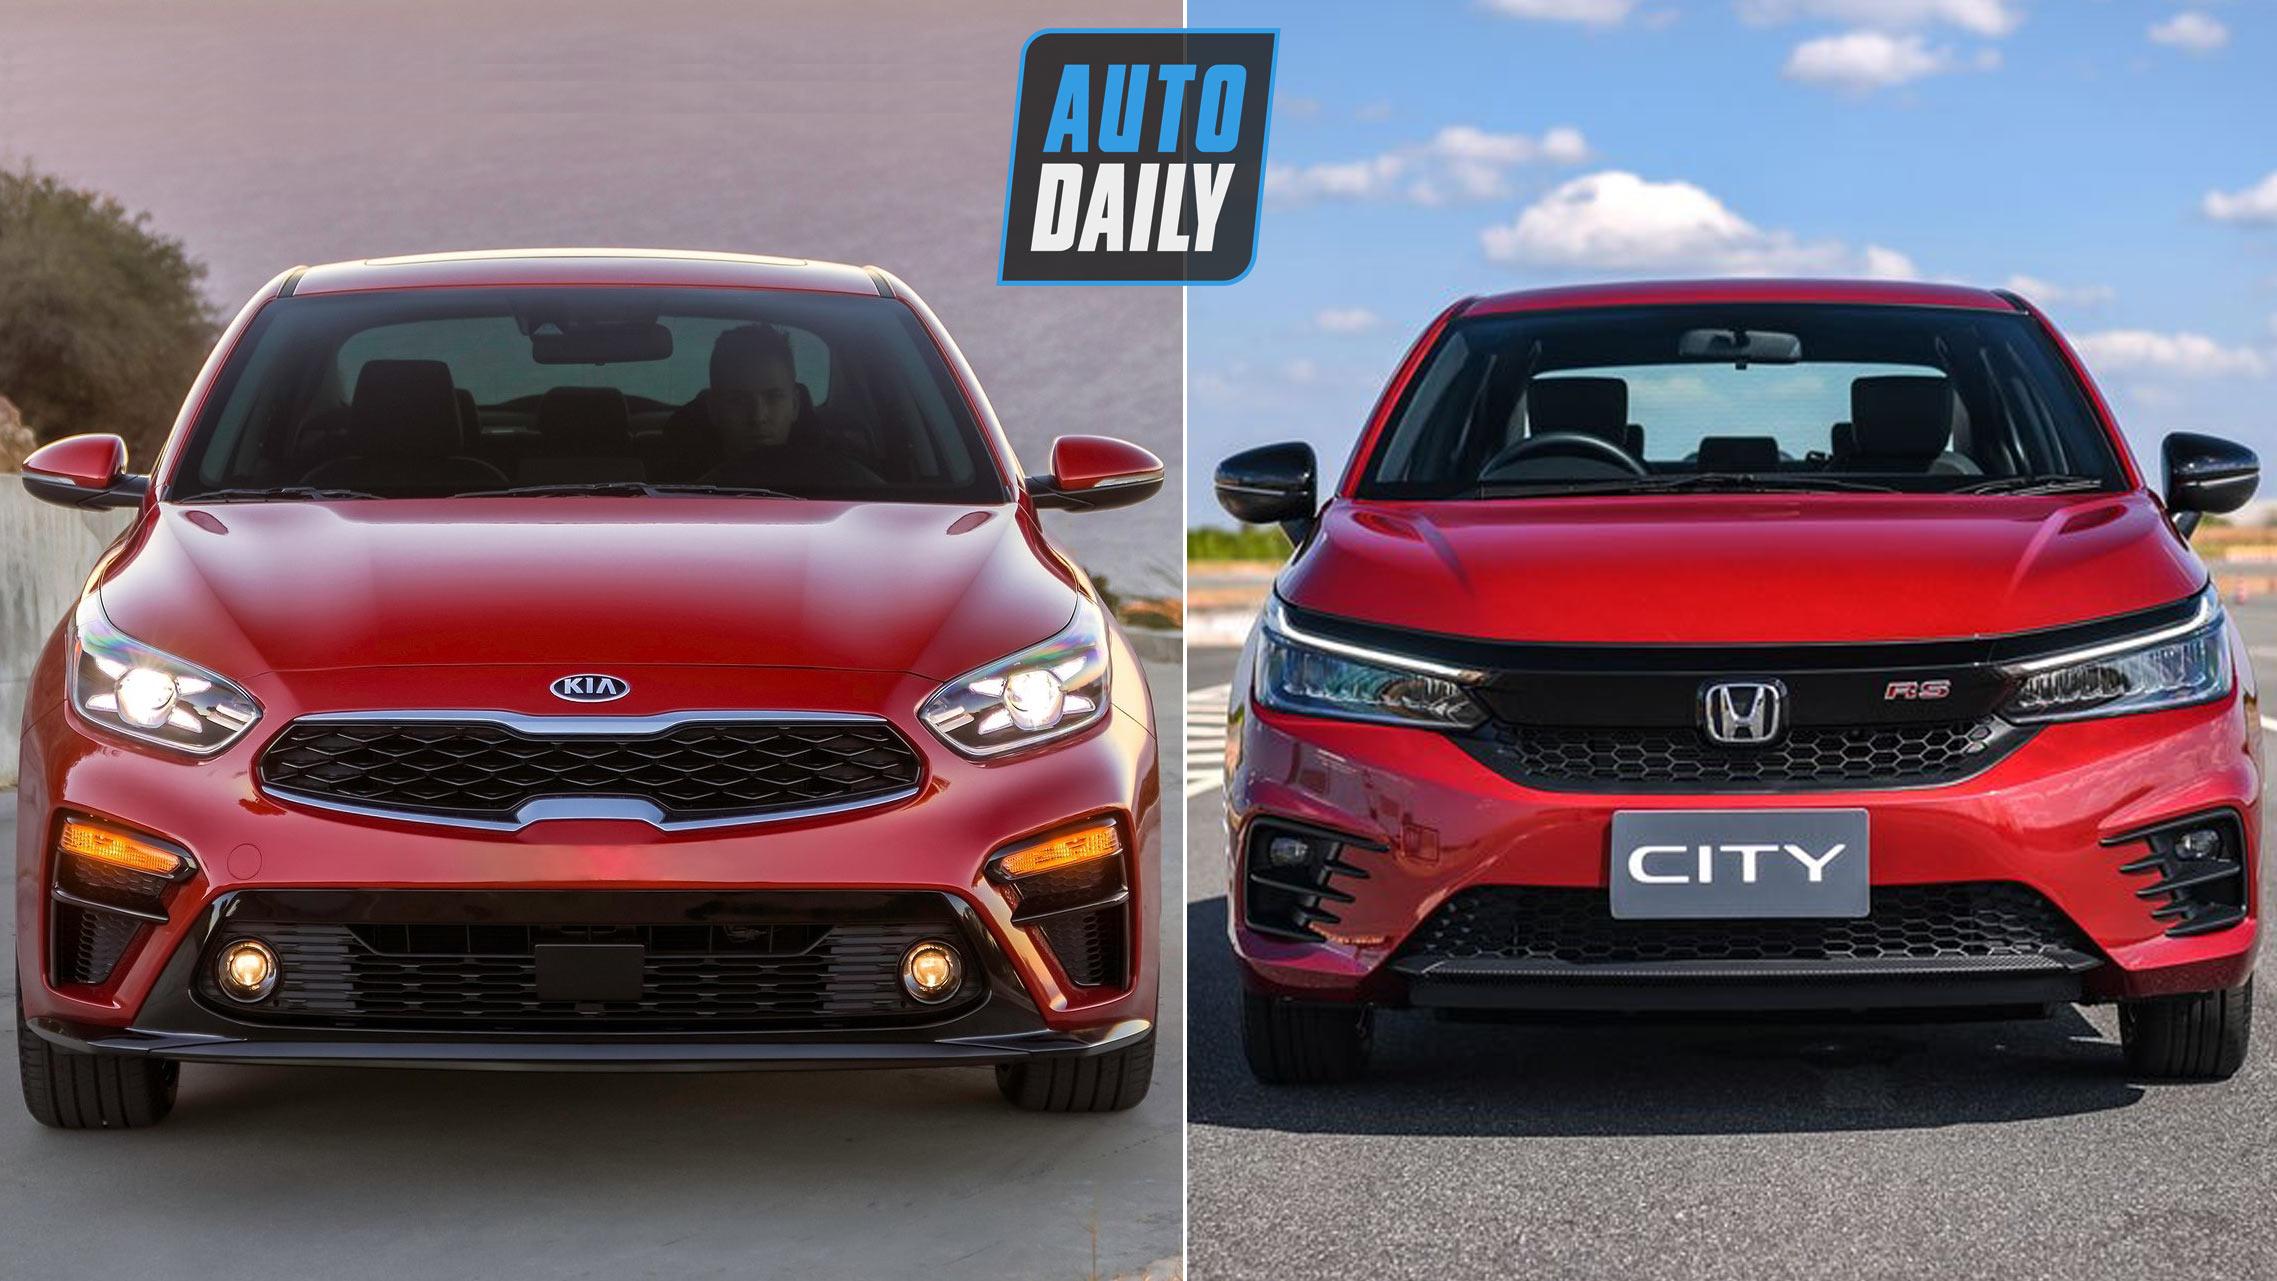 600 triệu, mua luôn Kia Cerato 1.6 hay chờ Honda City 2020?